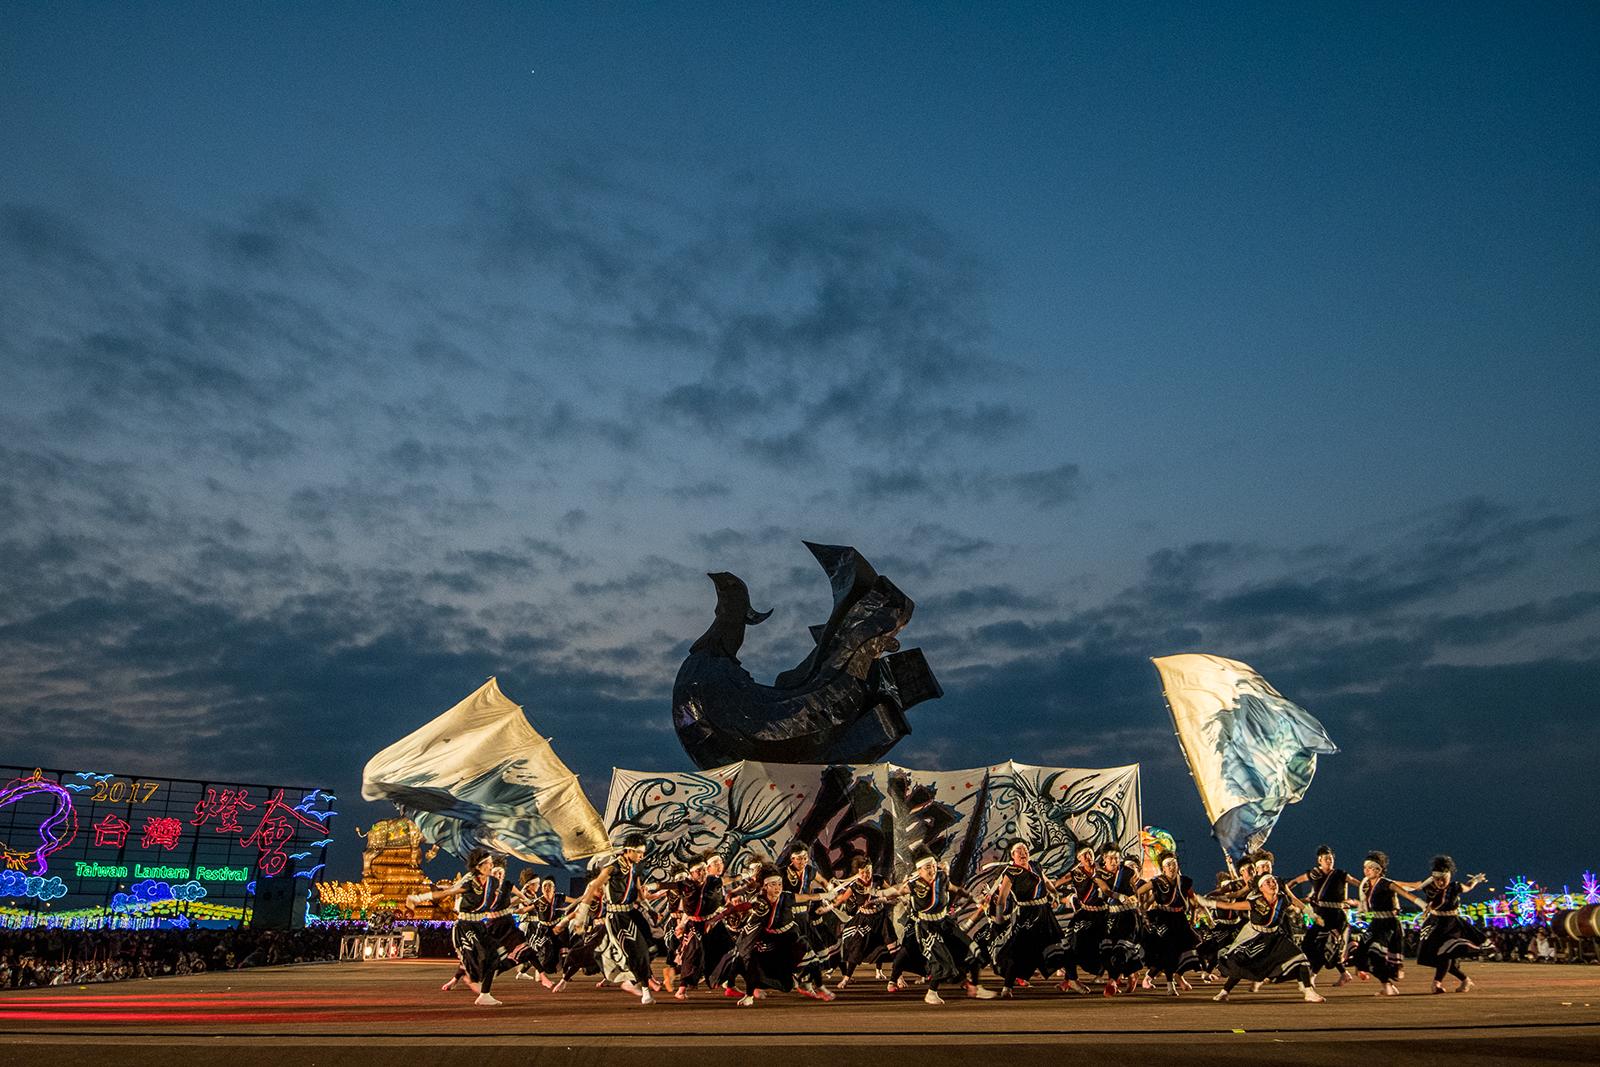 Taiwan Lantern Festival by Neil Ever Osborne